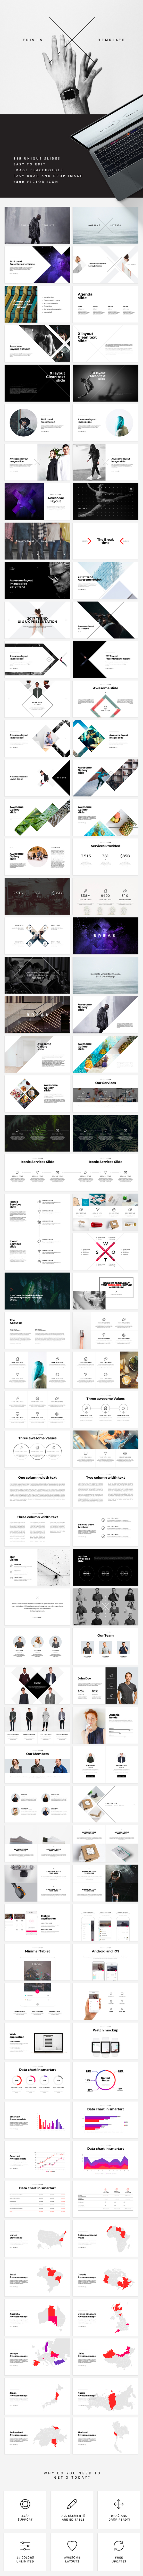 X Keynote Template - Creative Keynote Templates